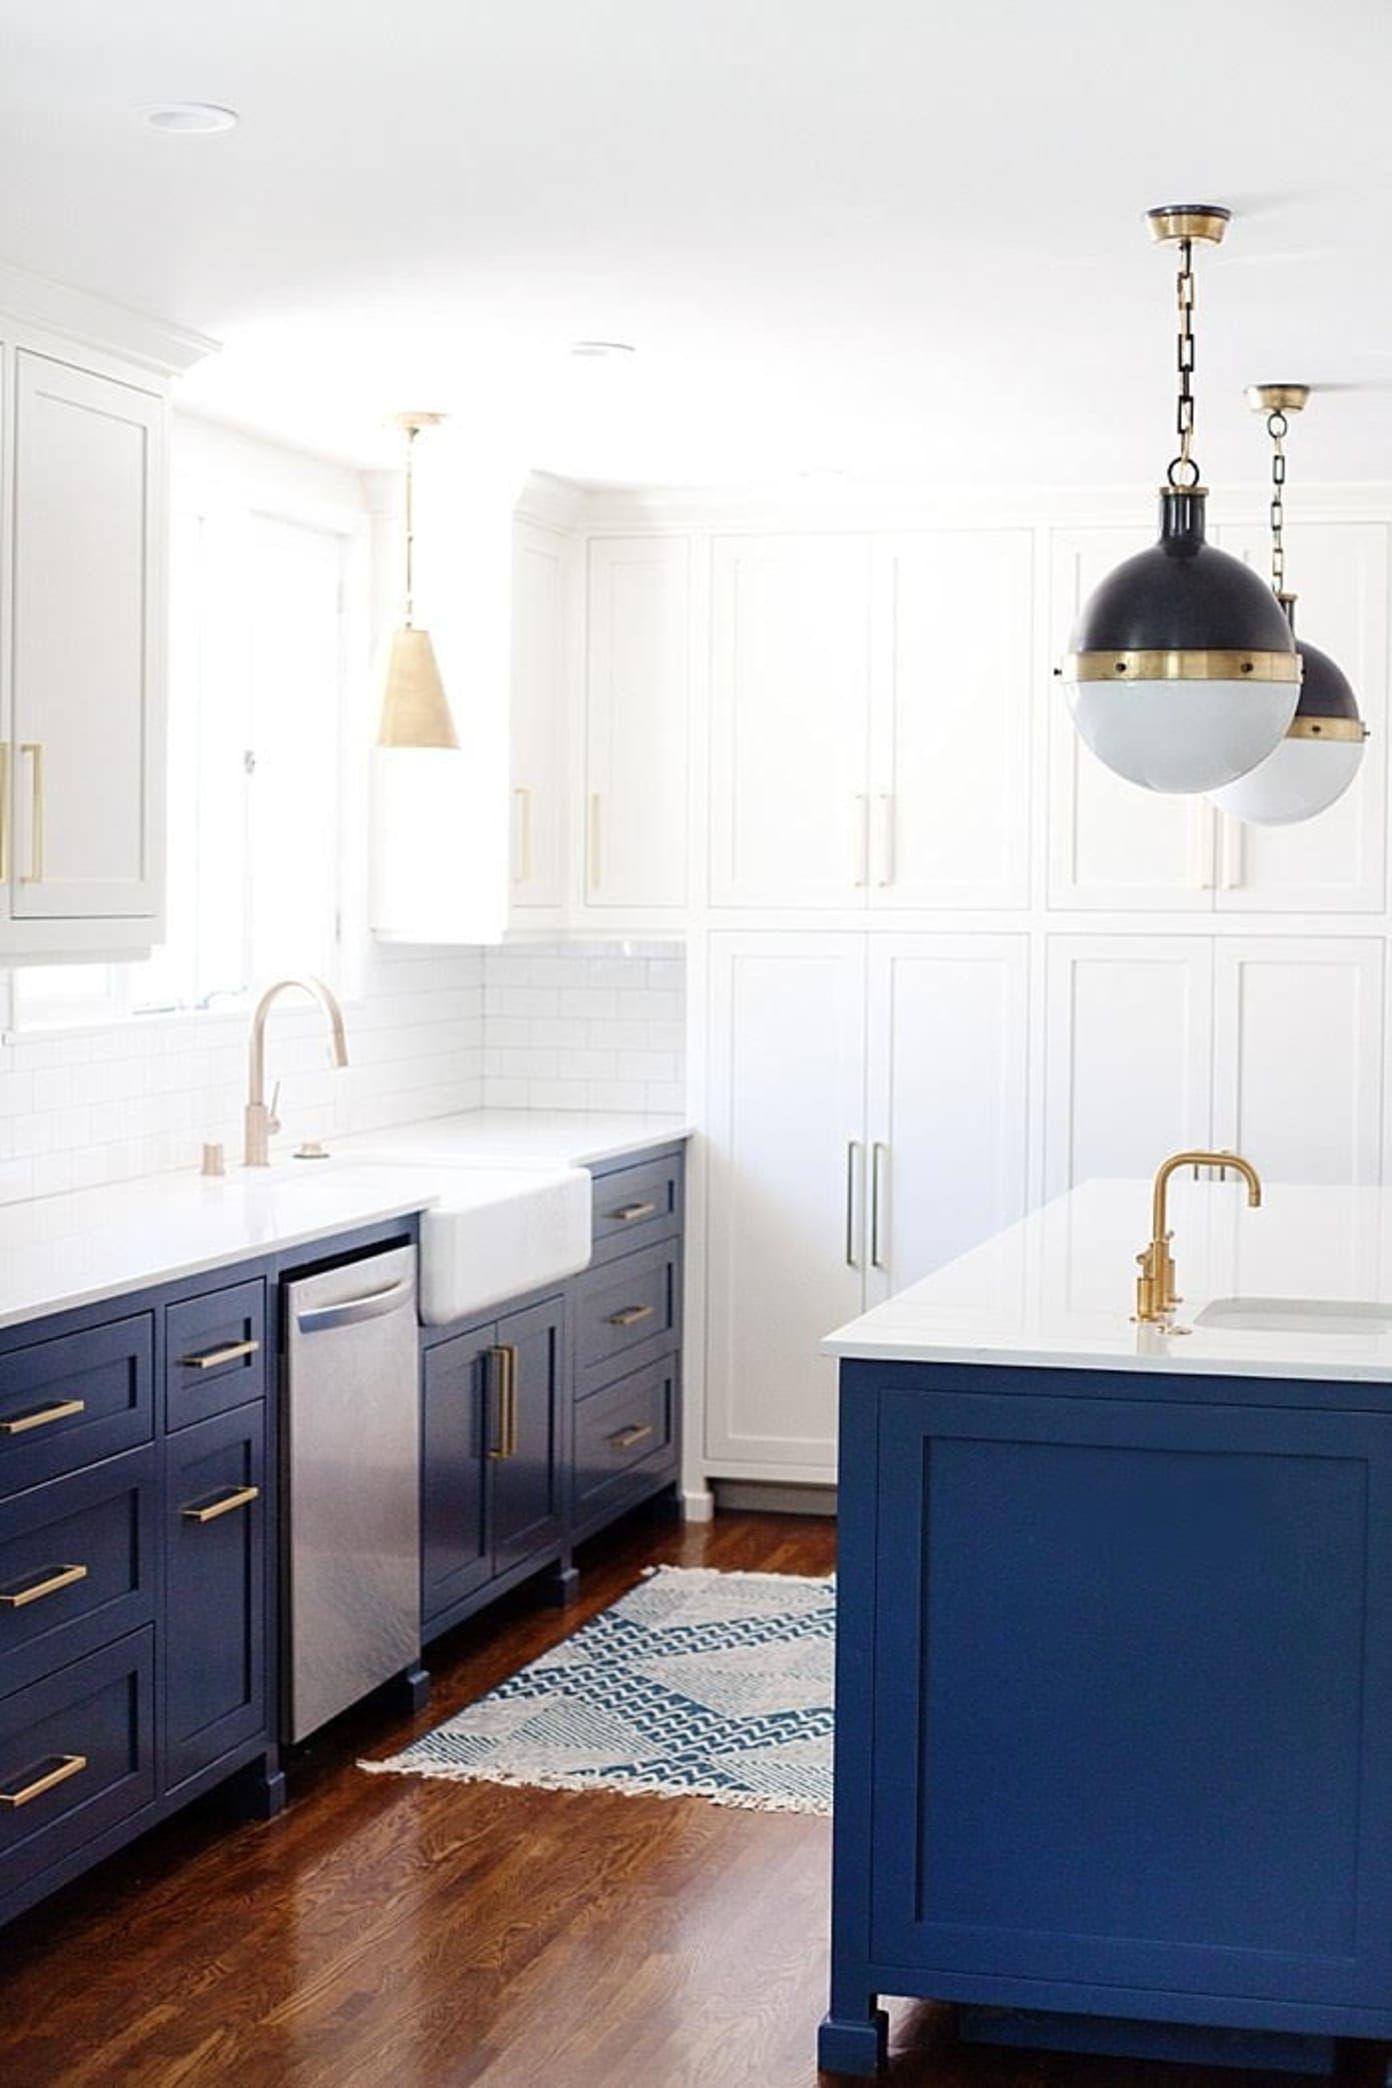 The 7 Best Cabinet Paint Colors for a Happier Kitchen ...